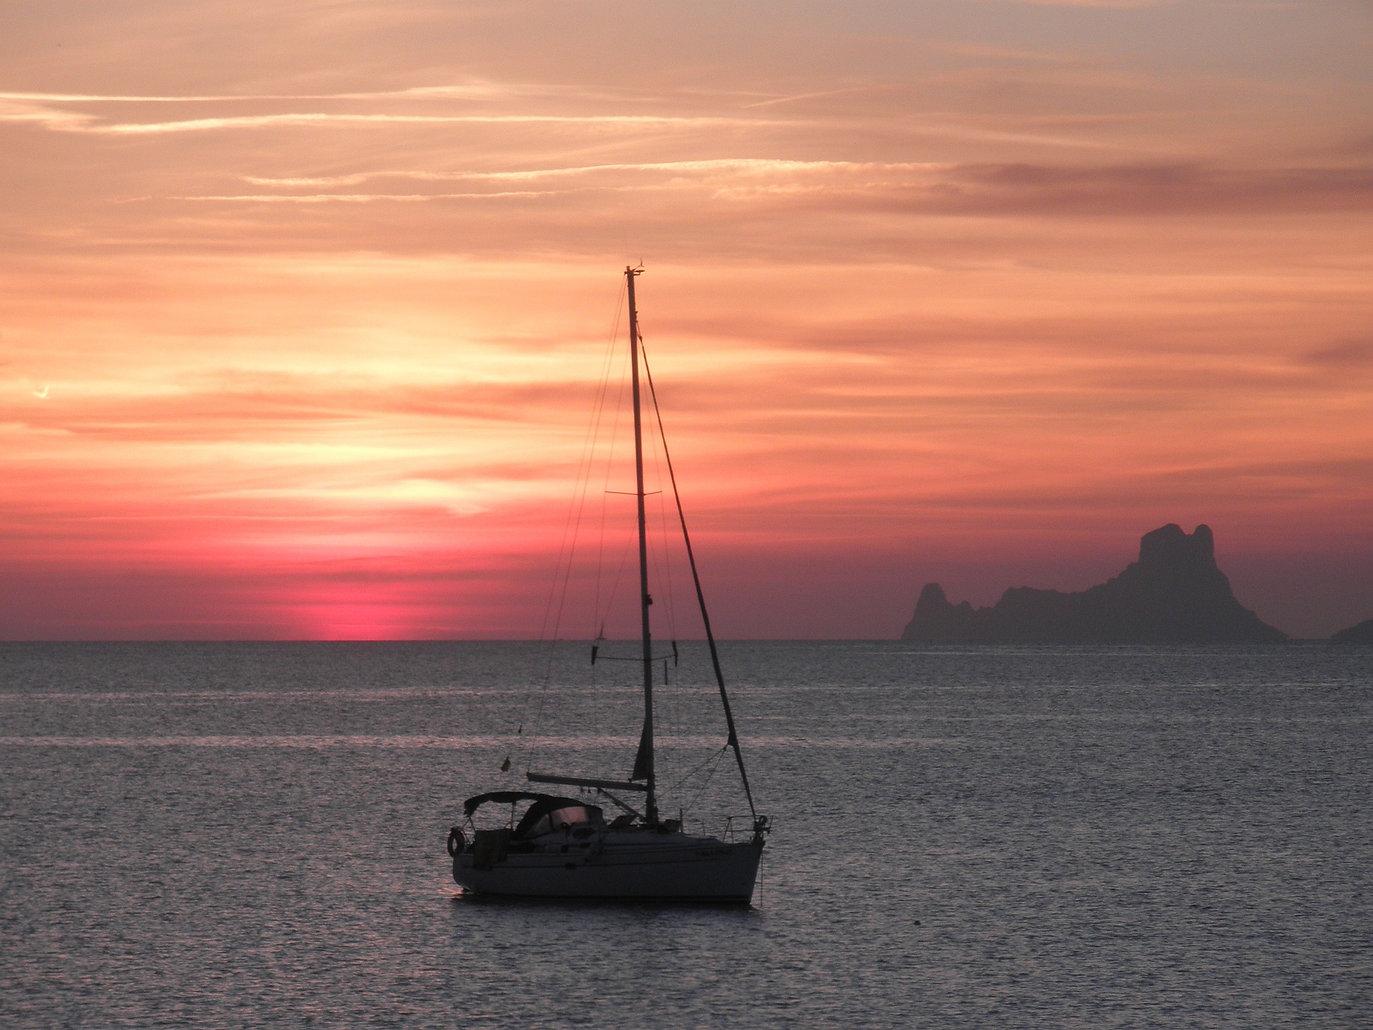 sunset-1320645_1920.jpg